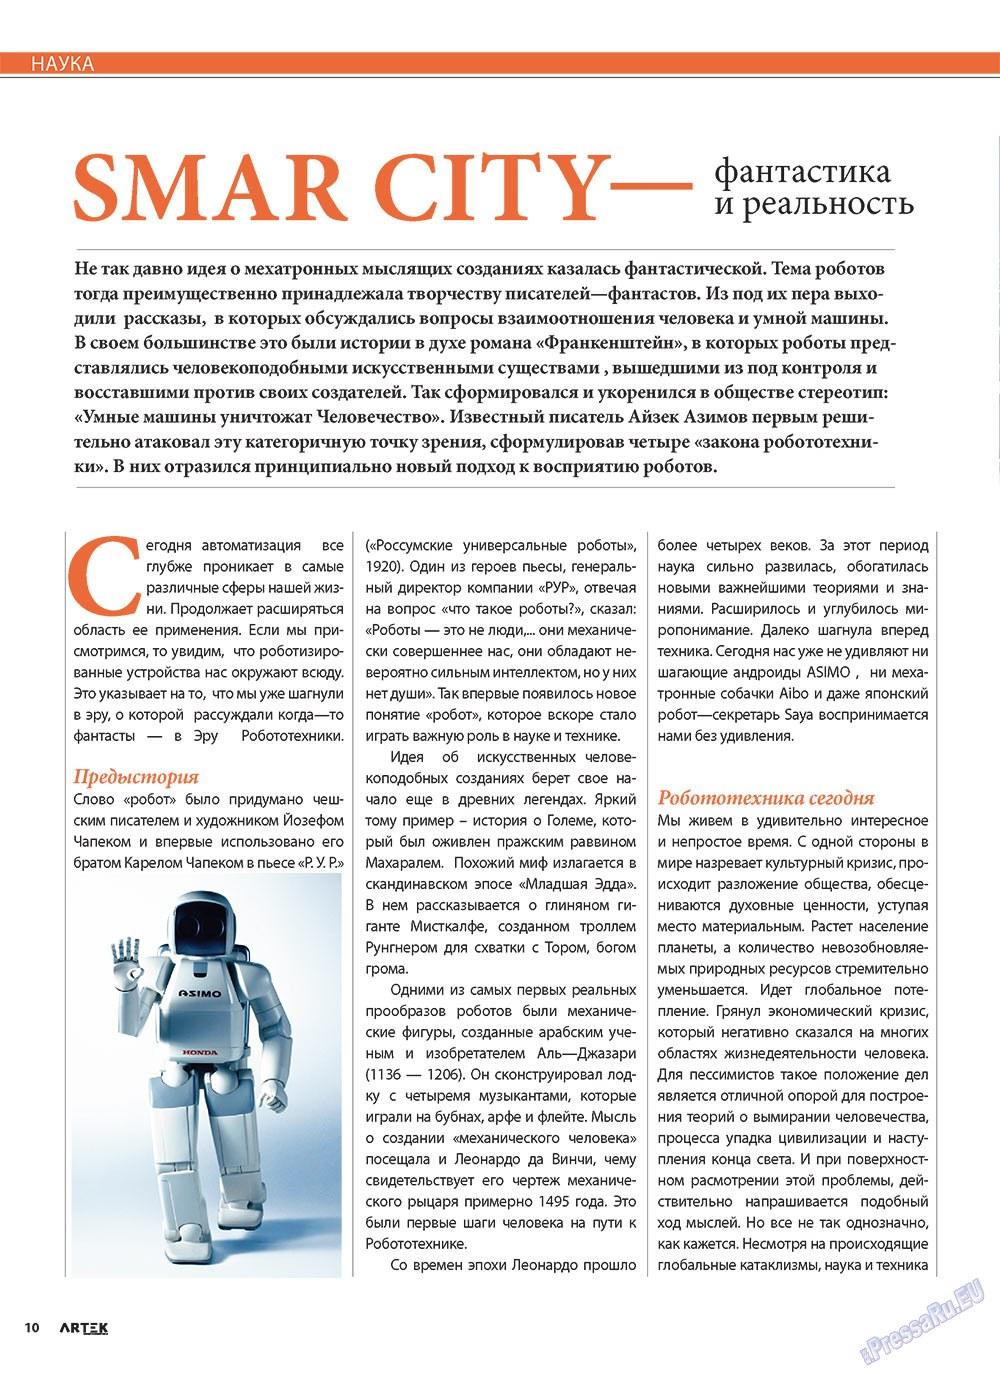 Артек (журнал). 2010 год, номер 6, стр. 12